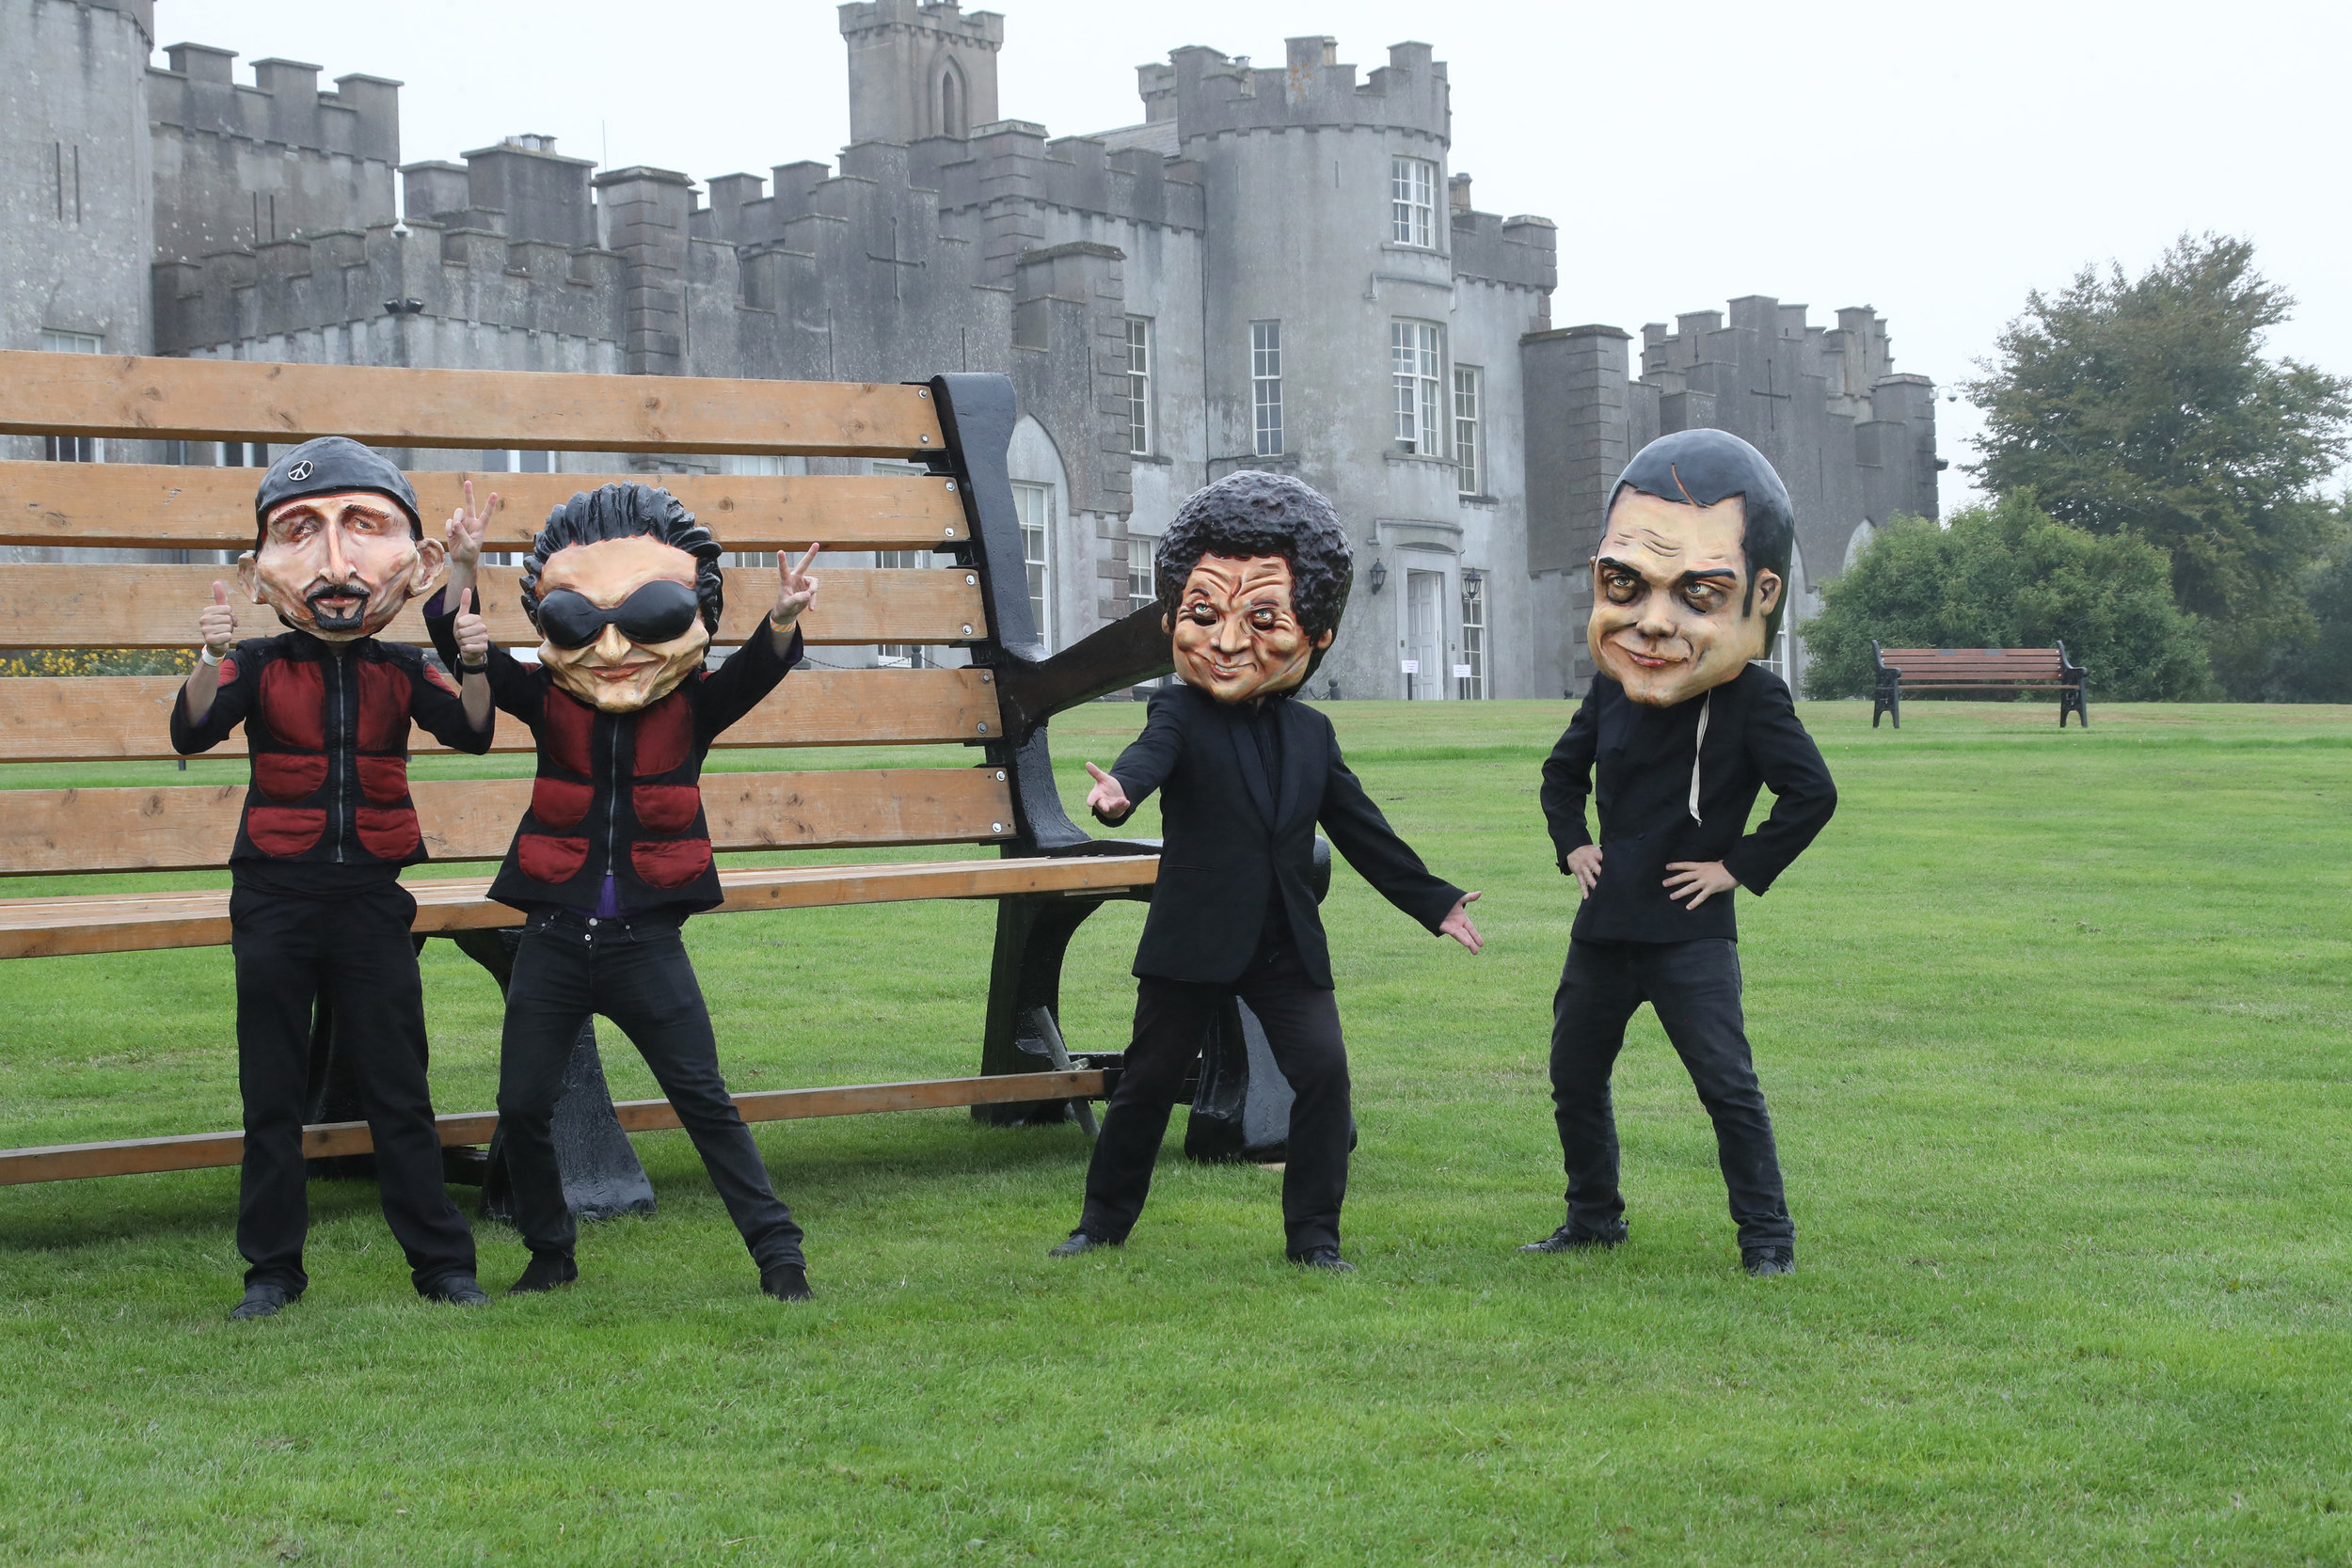 U2 Massive Heads - Ardgillan (1).JPG